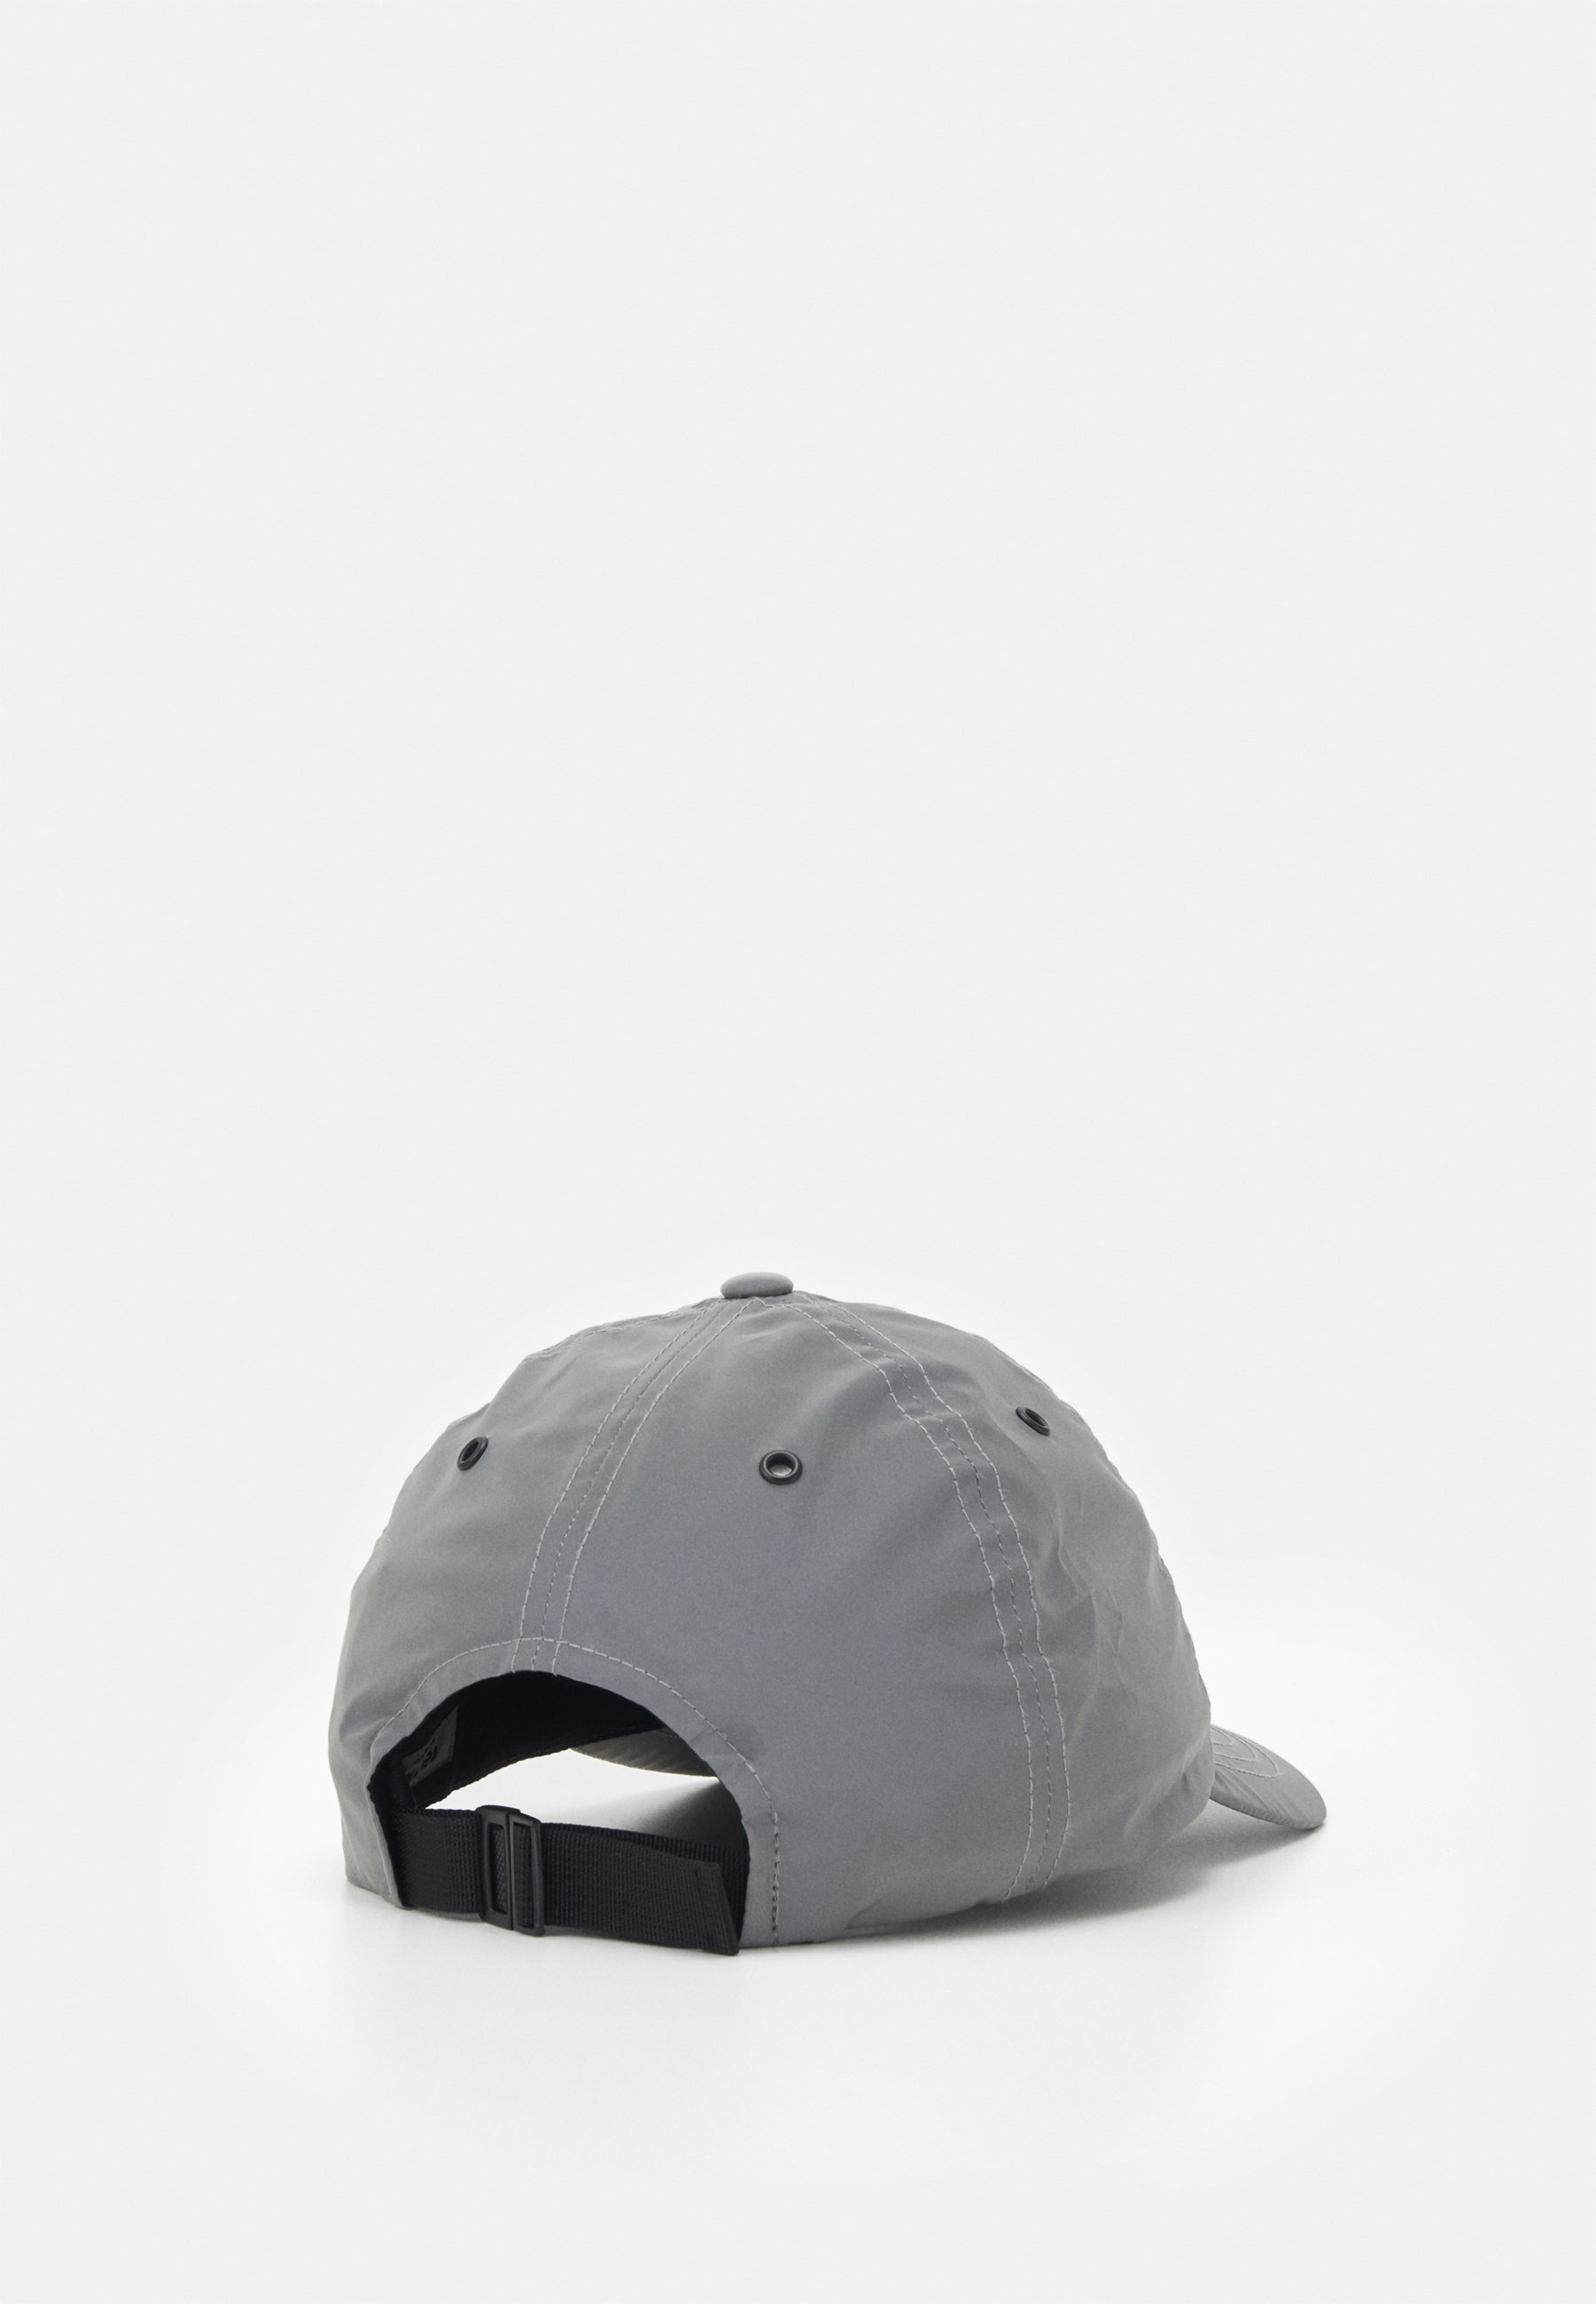 Carhartt Wip Flect Cap - Mütze Reflective Grey/silber